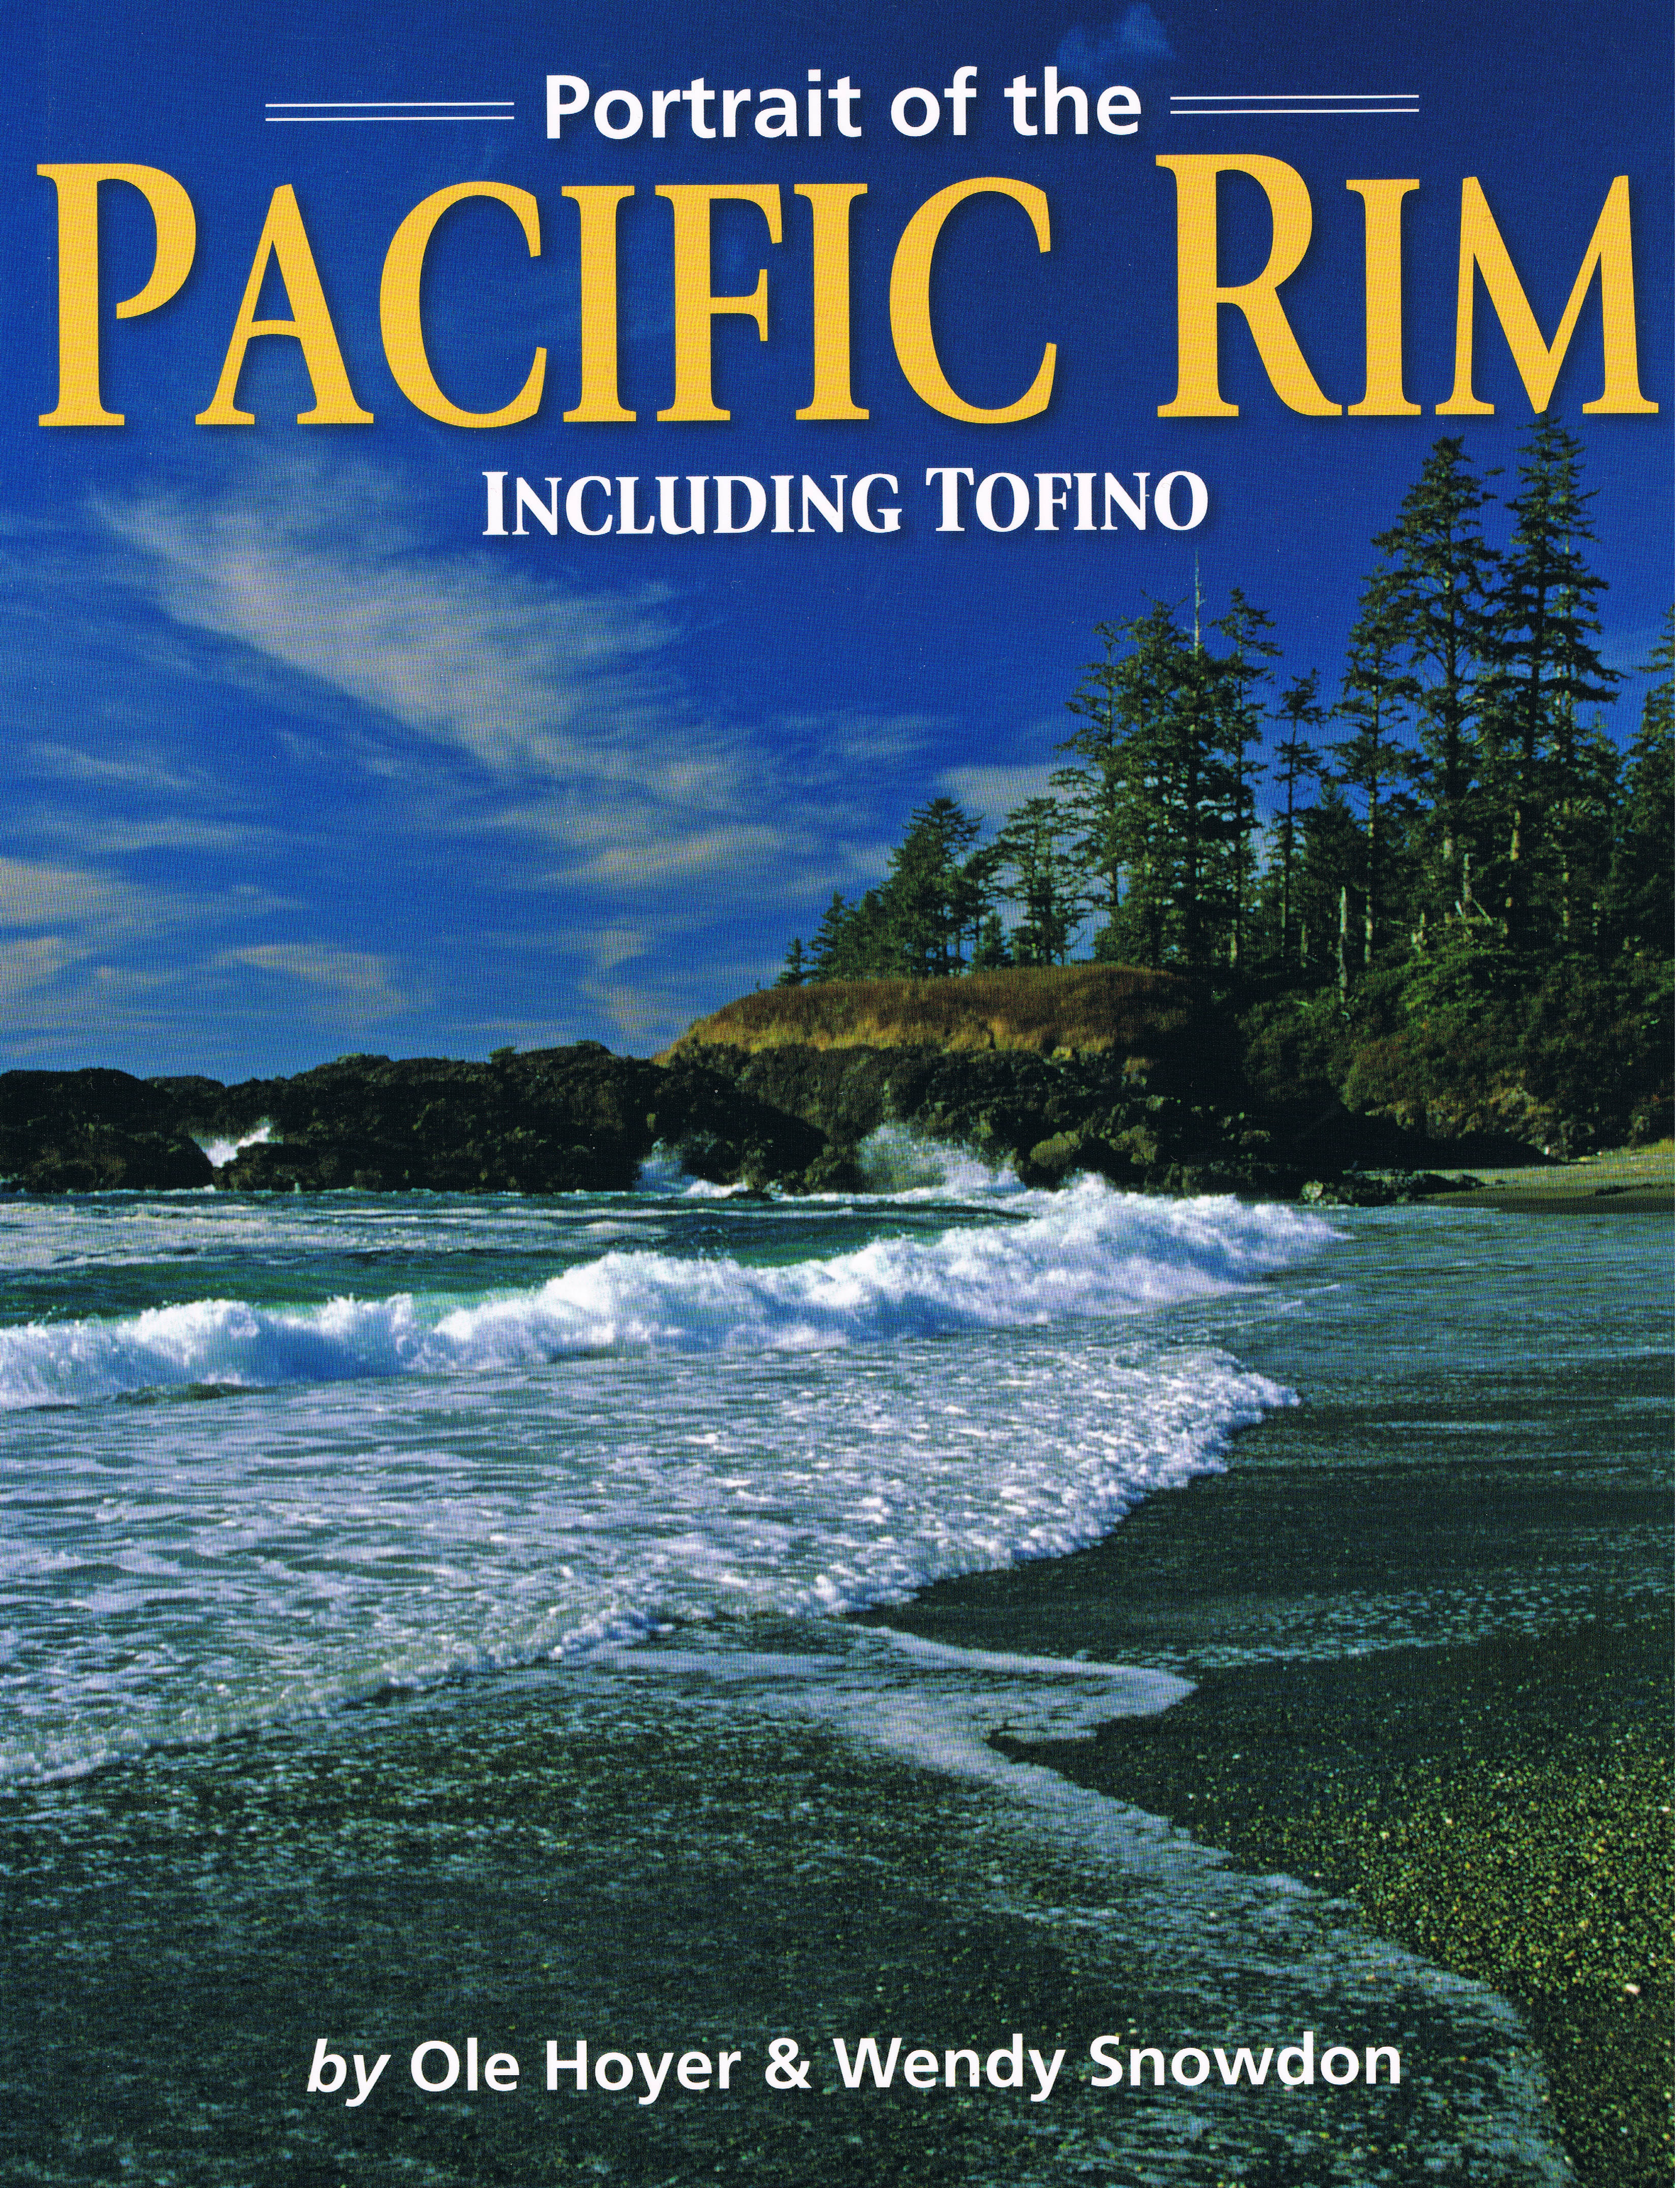 Portrait of the Pacific Rim